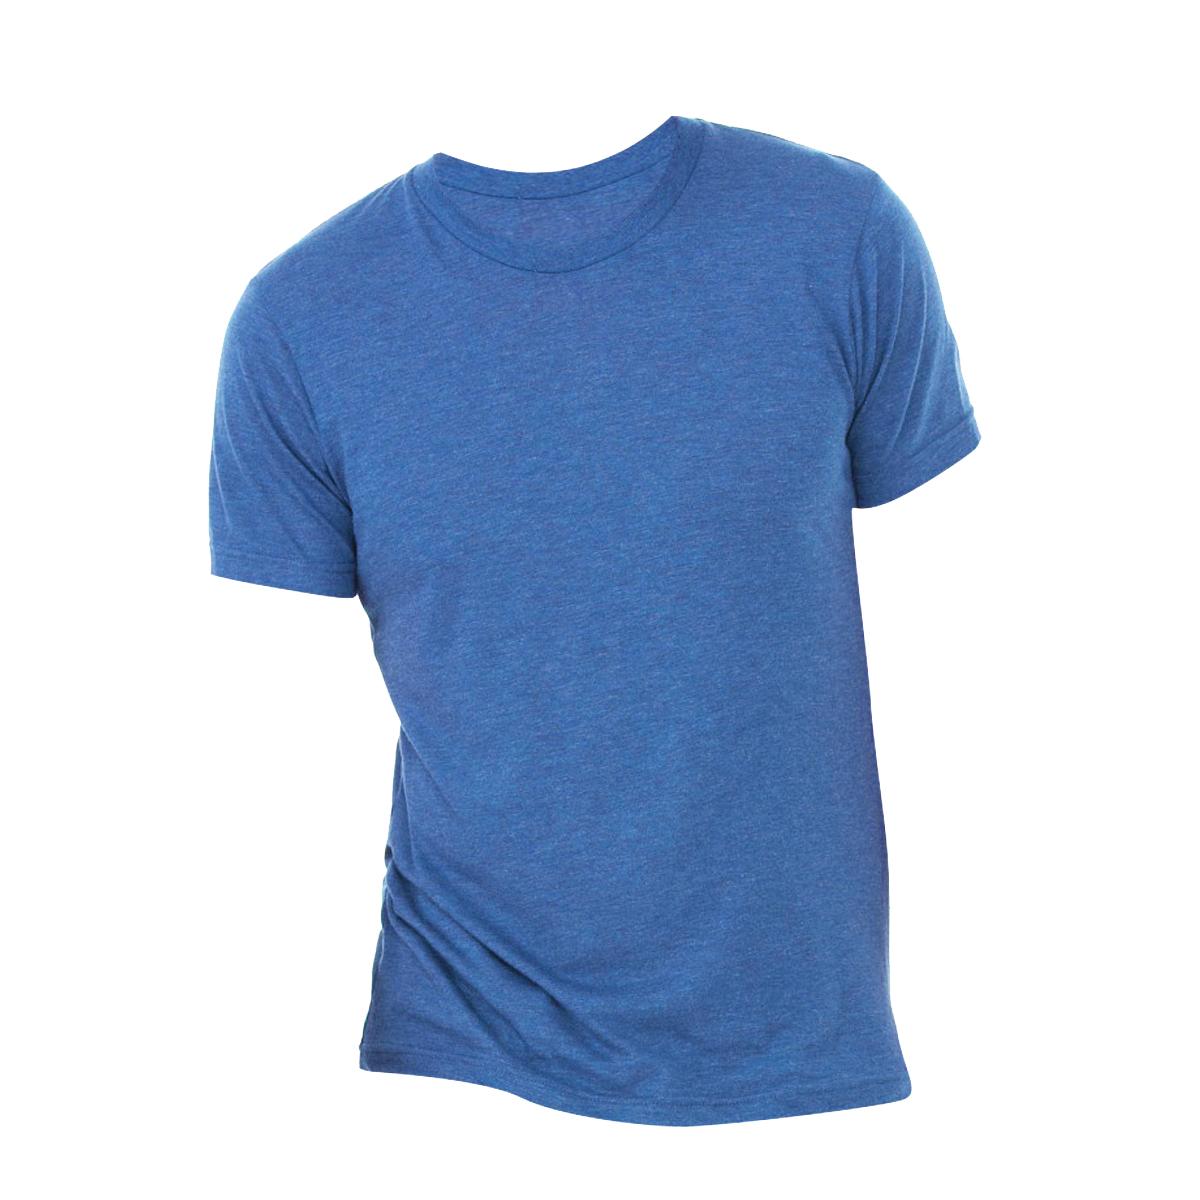 Canvas Mens Triblend Crew Neck Plain Short Sleeve T-Shirt (2XL) (Mint Triblend)